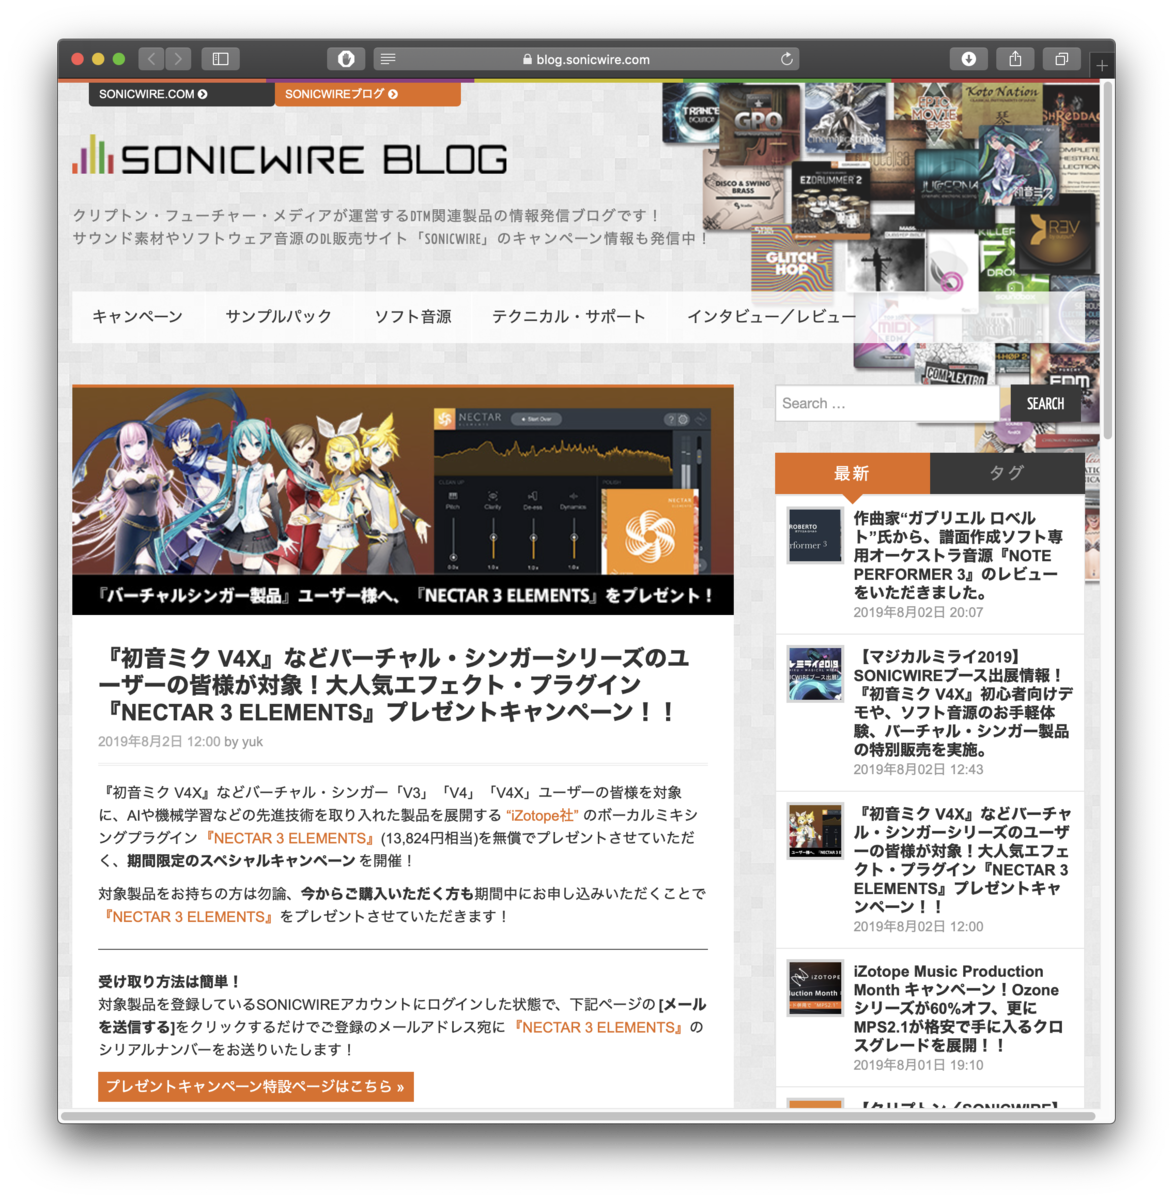 f:id:keisei_1092:20190804114547p:plain